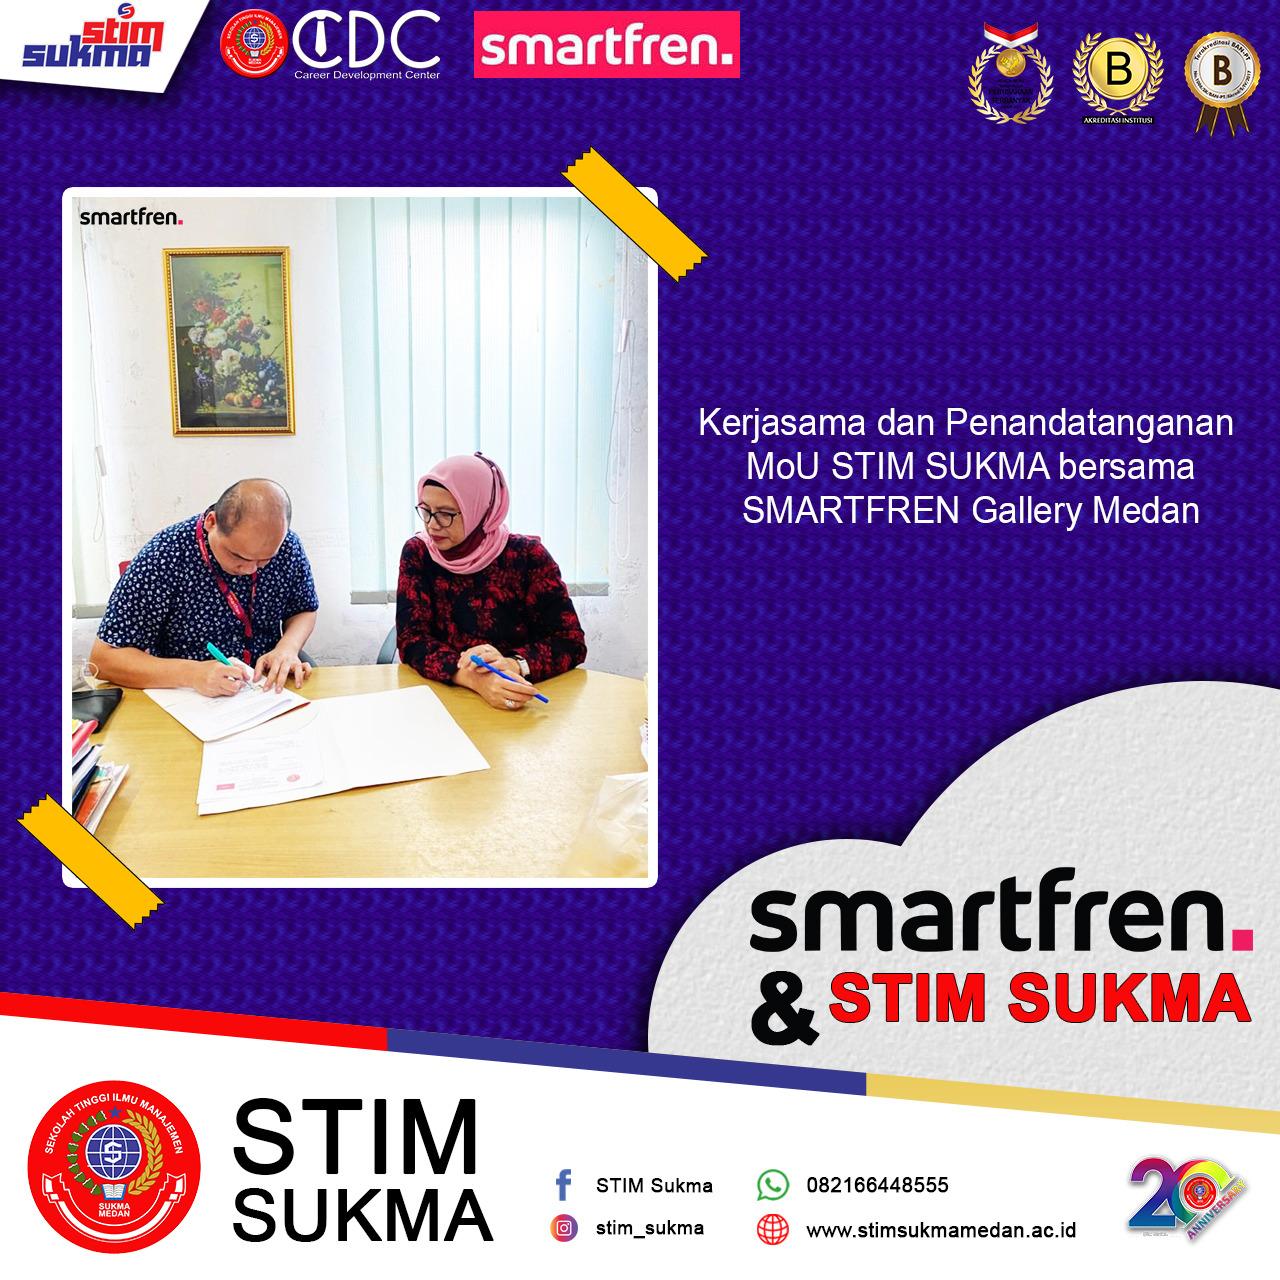 kerjasama stim sukma bersama smartfren